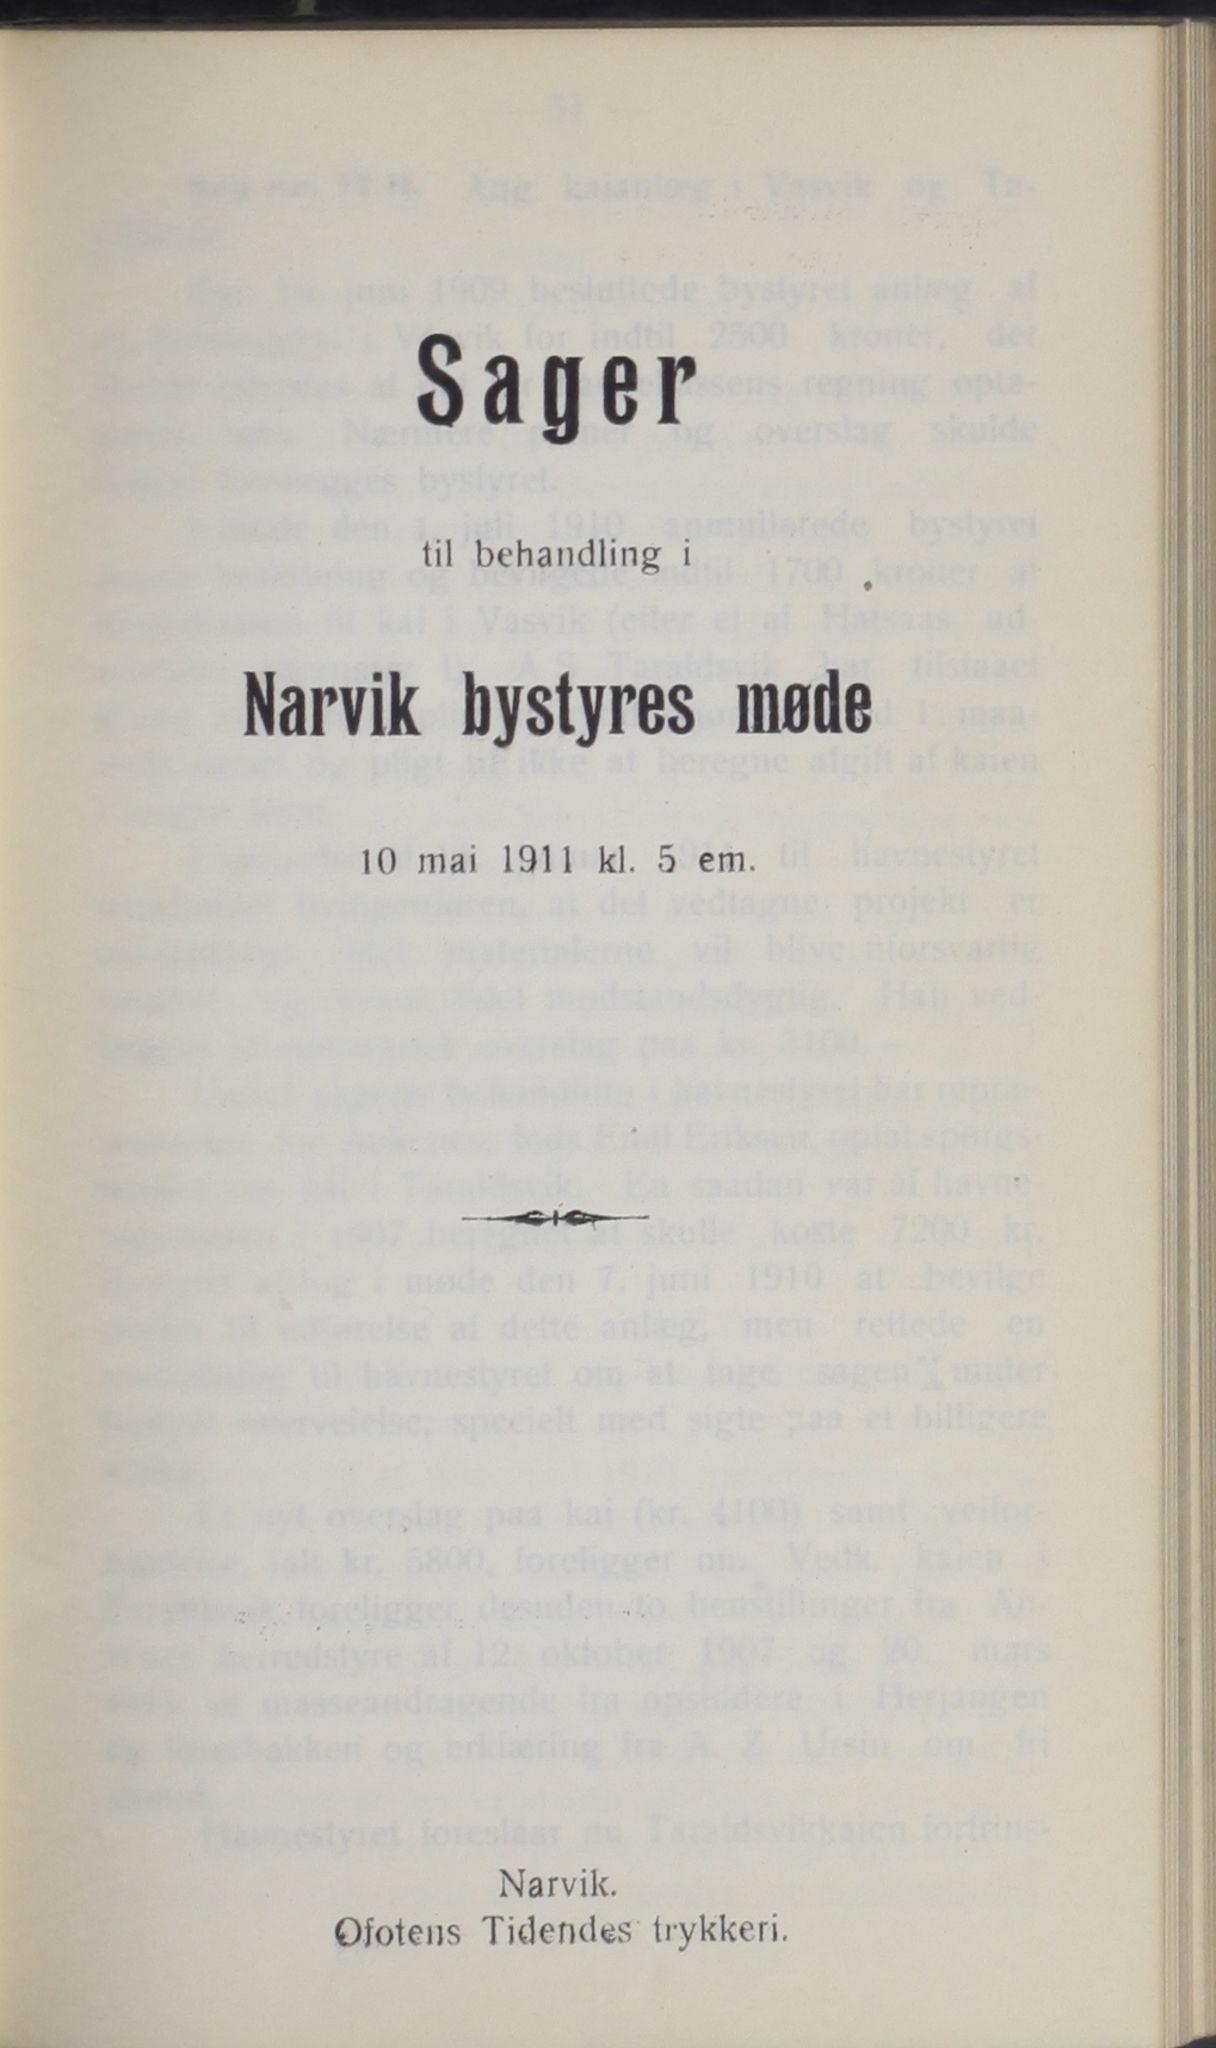 AIN, Narvik kommune. Formannskap , A/Ab/L0001: Møtebok, 1911